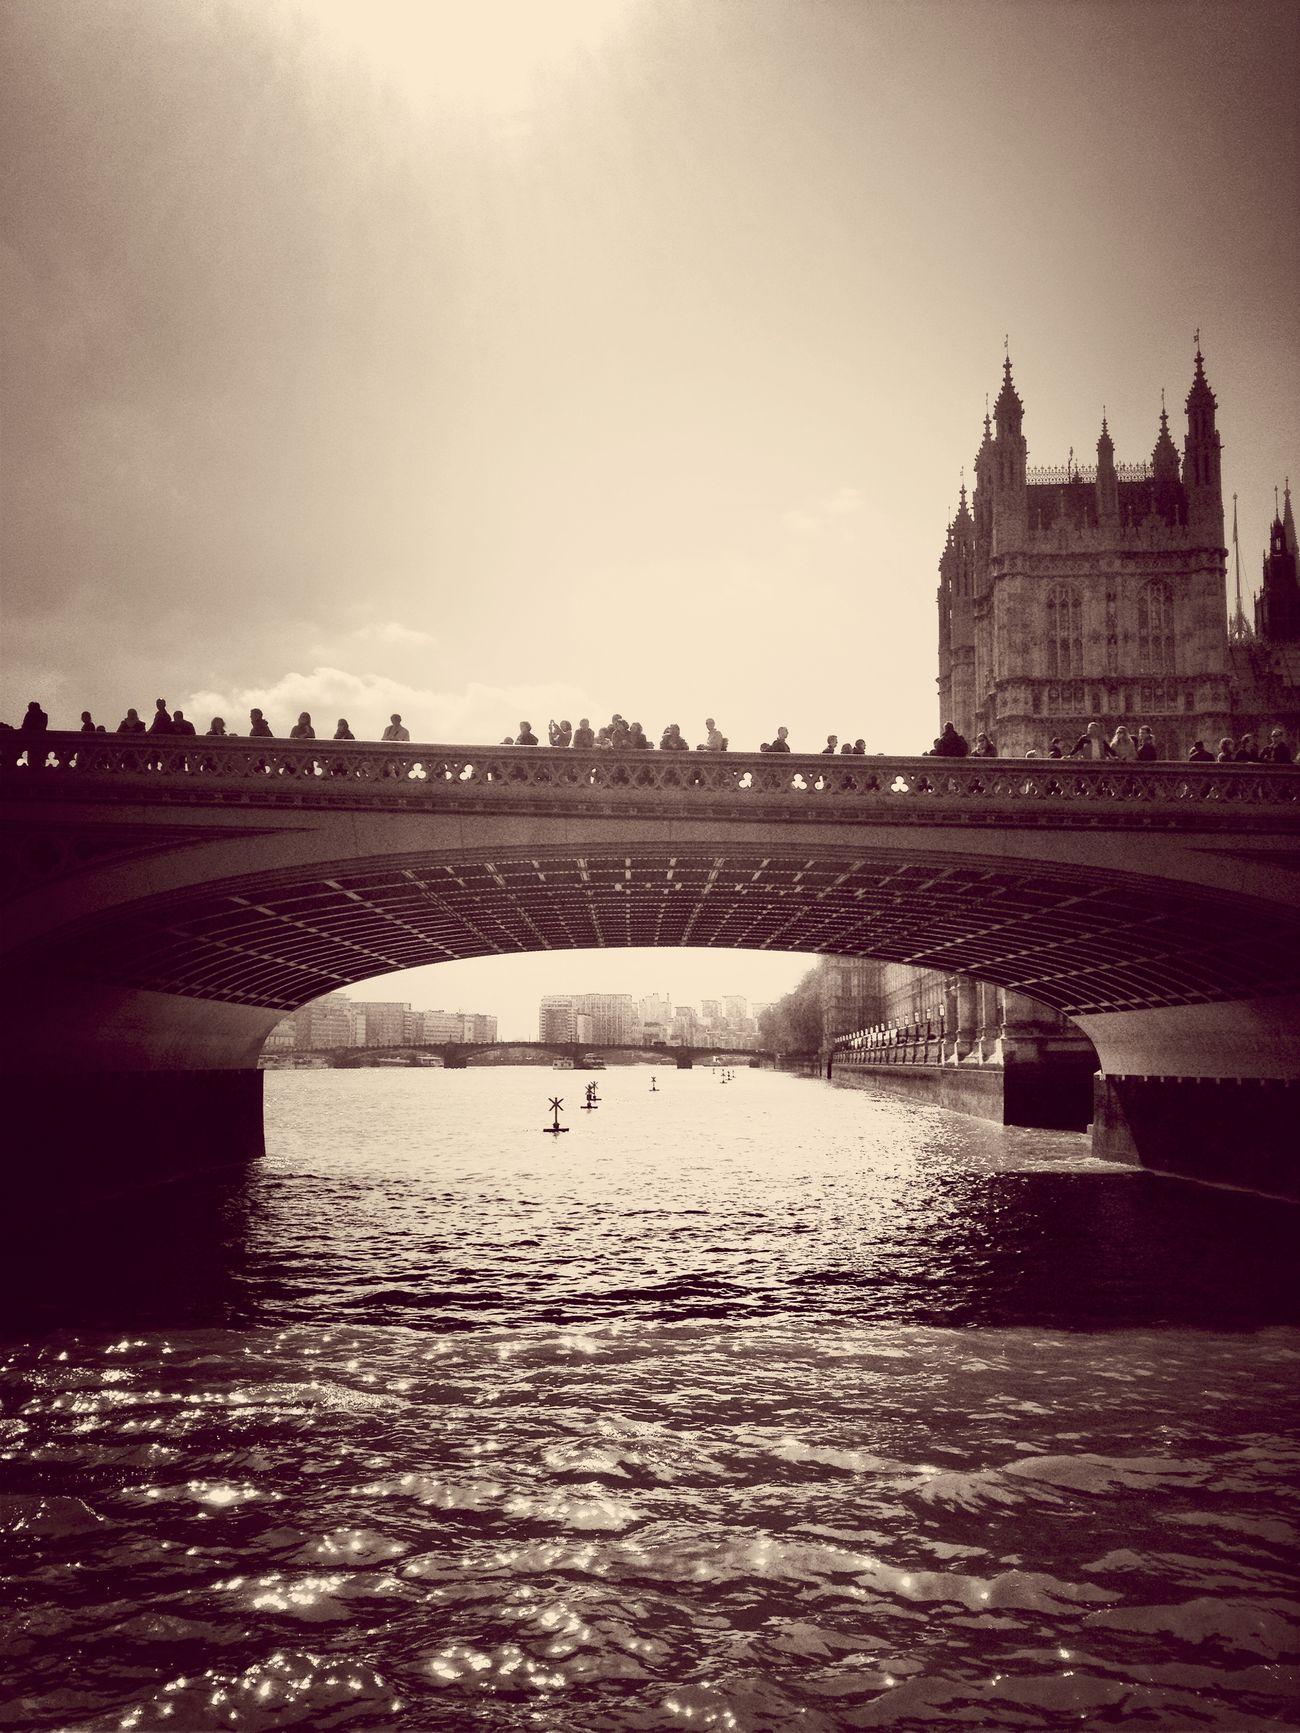 At Westminster Bridge